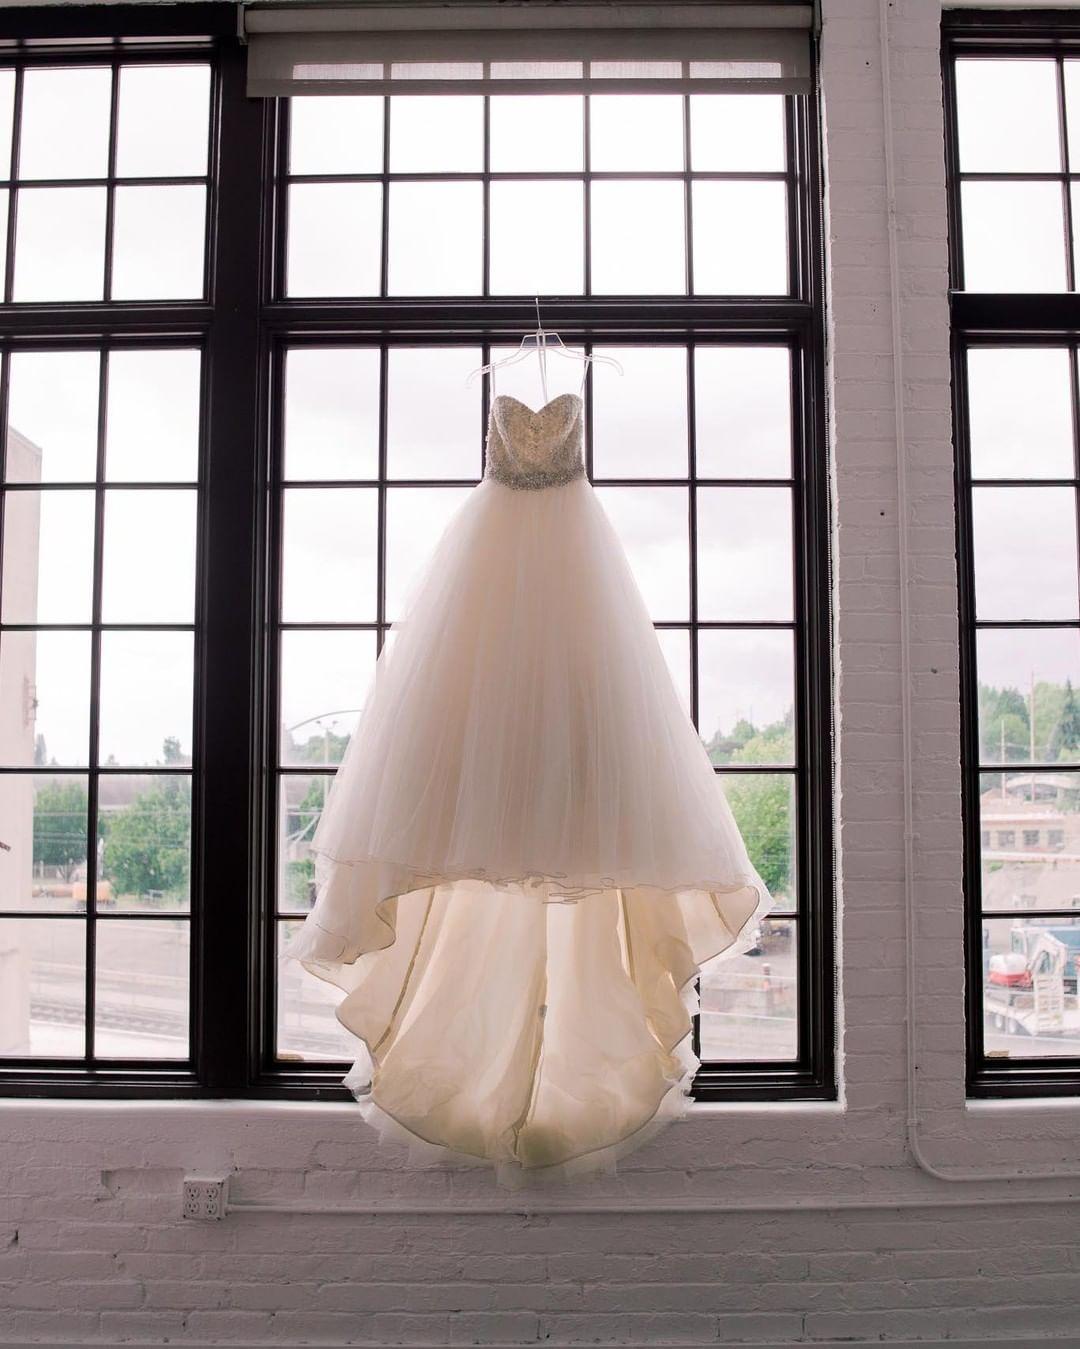 @jaclynolsonphoto posted to Instagram: Another day, another dress. 💫 . . . .  #loveandwildhearts #authenticlovemag #photobugcommunity #belovedstories #destinationweddingphotographer #lookslikefilm #weddinginspo #radlovestories #muchlove_ig #junebugwedding #magnoliarouge #wedventuremag #ruffledblog #weddingsparrow #jaclynolson #jaclynolsonphotography #weddingsparrow #thatsdarling #portlandweddingphotographer #oregonweddingphotographer #washingtonweddingphotographer #pnwweddingphotographer #